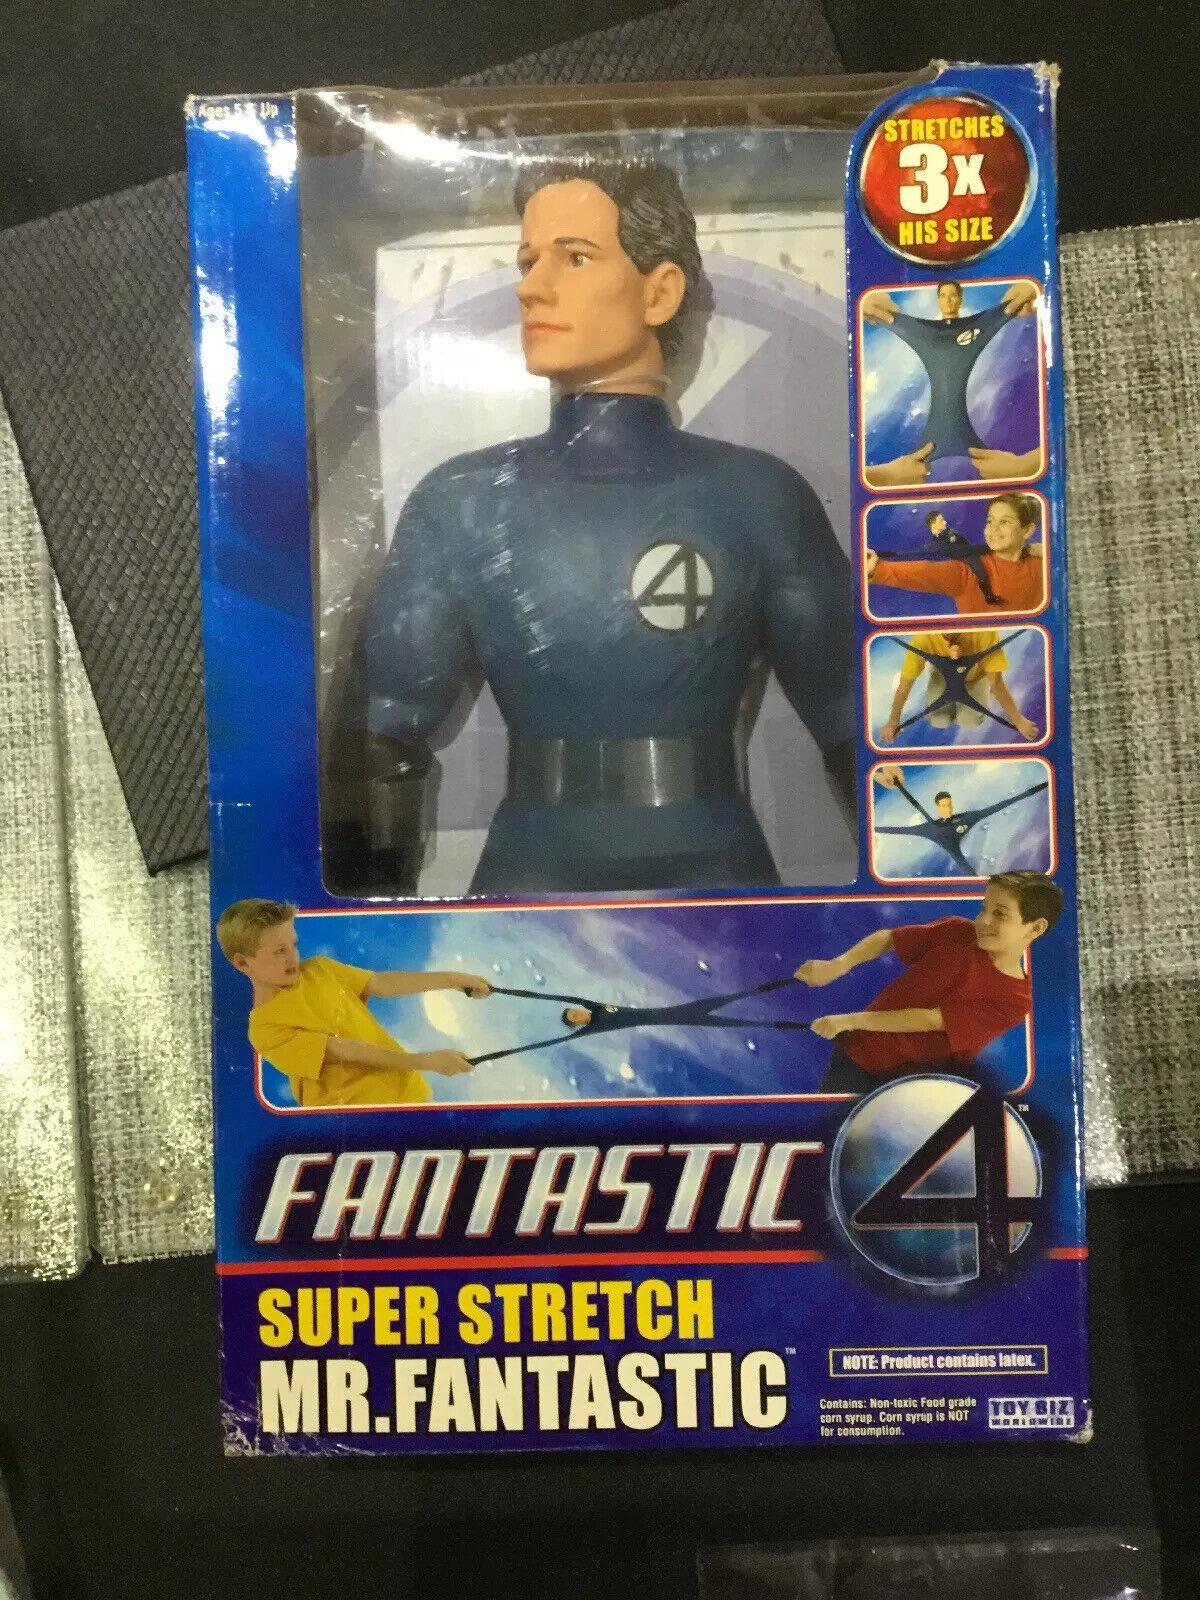 Fantastic Four - 14  Mr Fantastic Super Stretch Marvel ToyBiz 2005  LOOKS GREAT